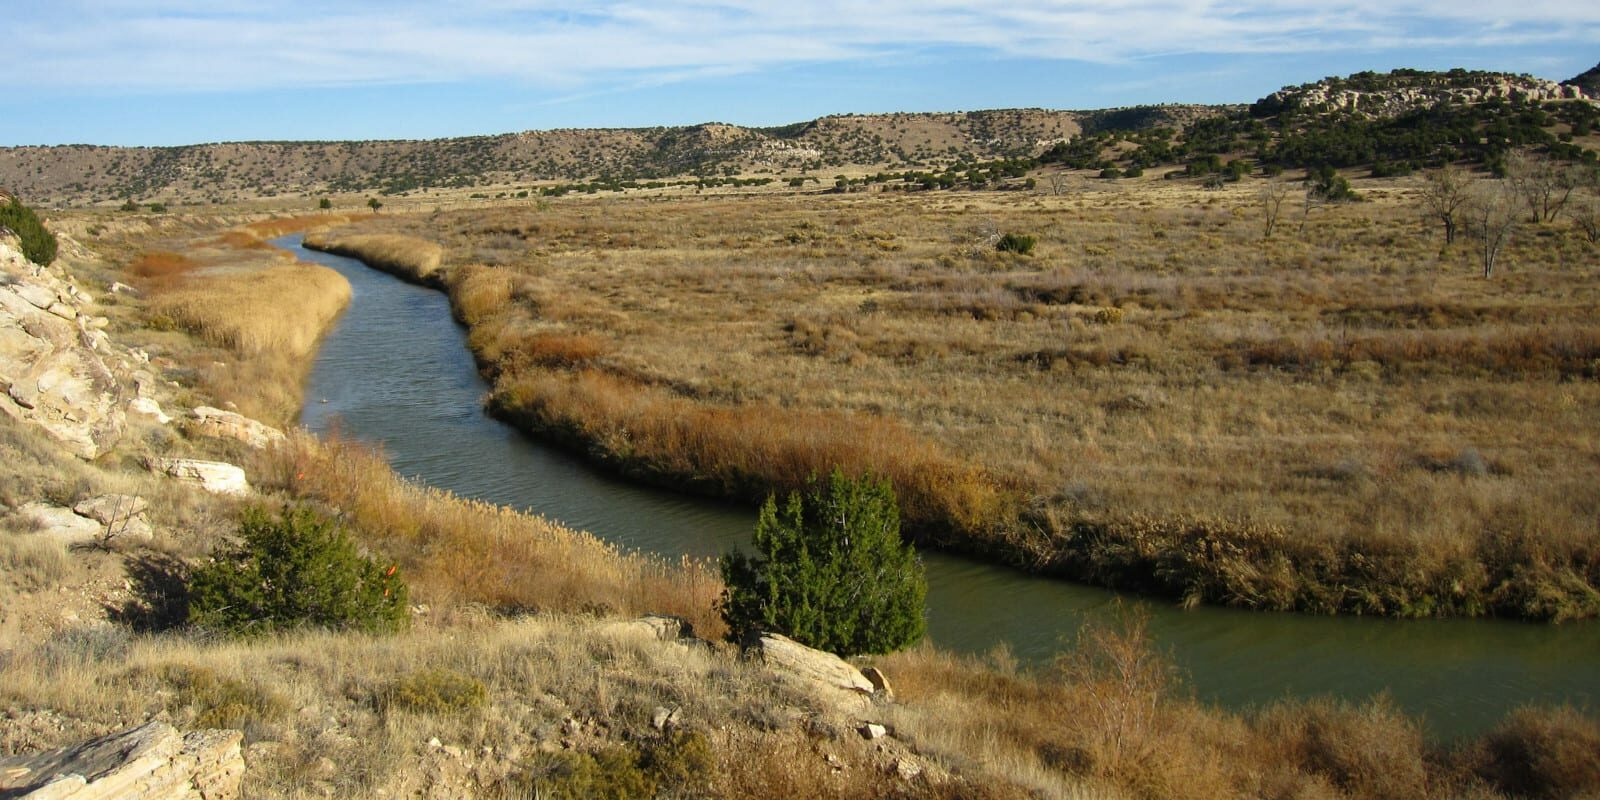 Image of the Purgatoire River flowing through the plains